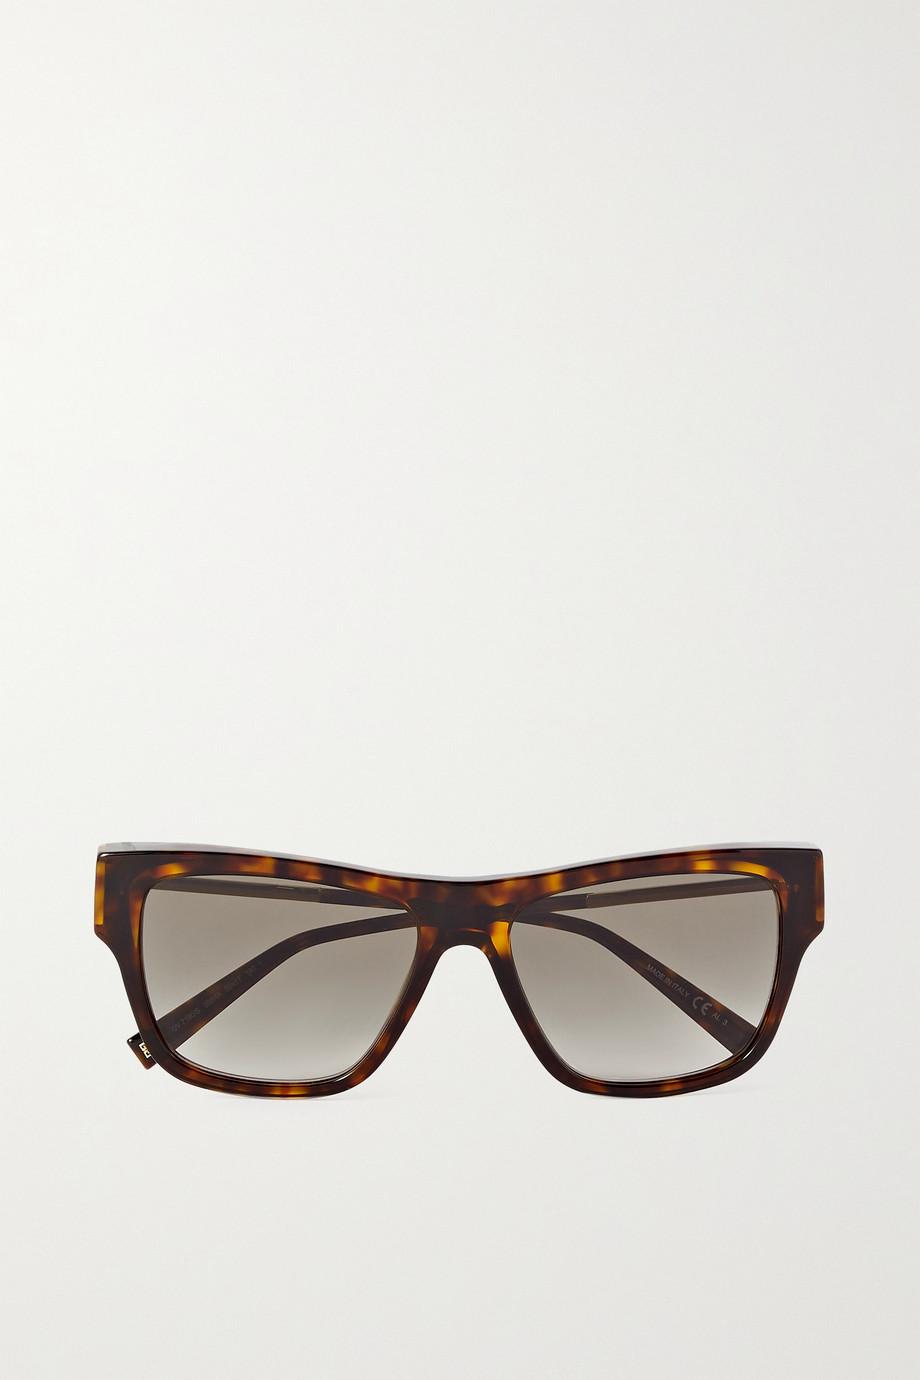 Givenchy Oversized D-frame tortoiseshell acetate and gold-tone sunglasses